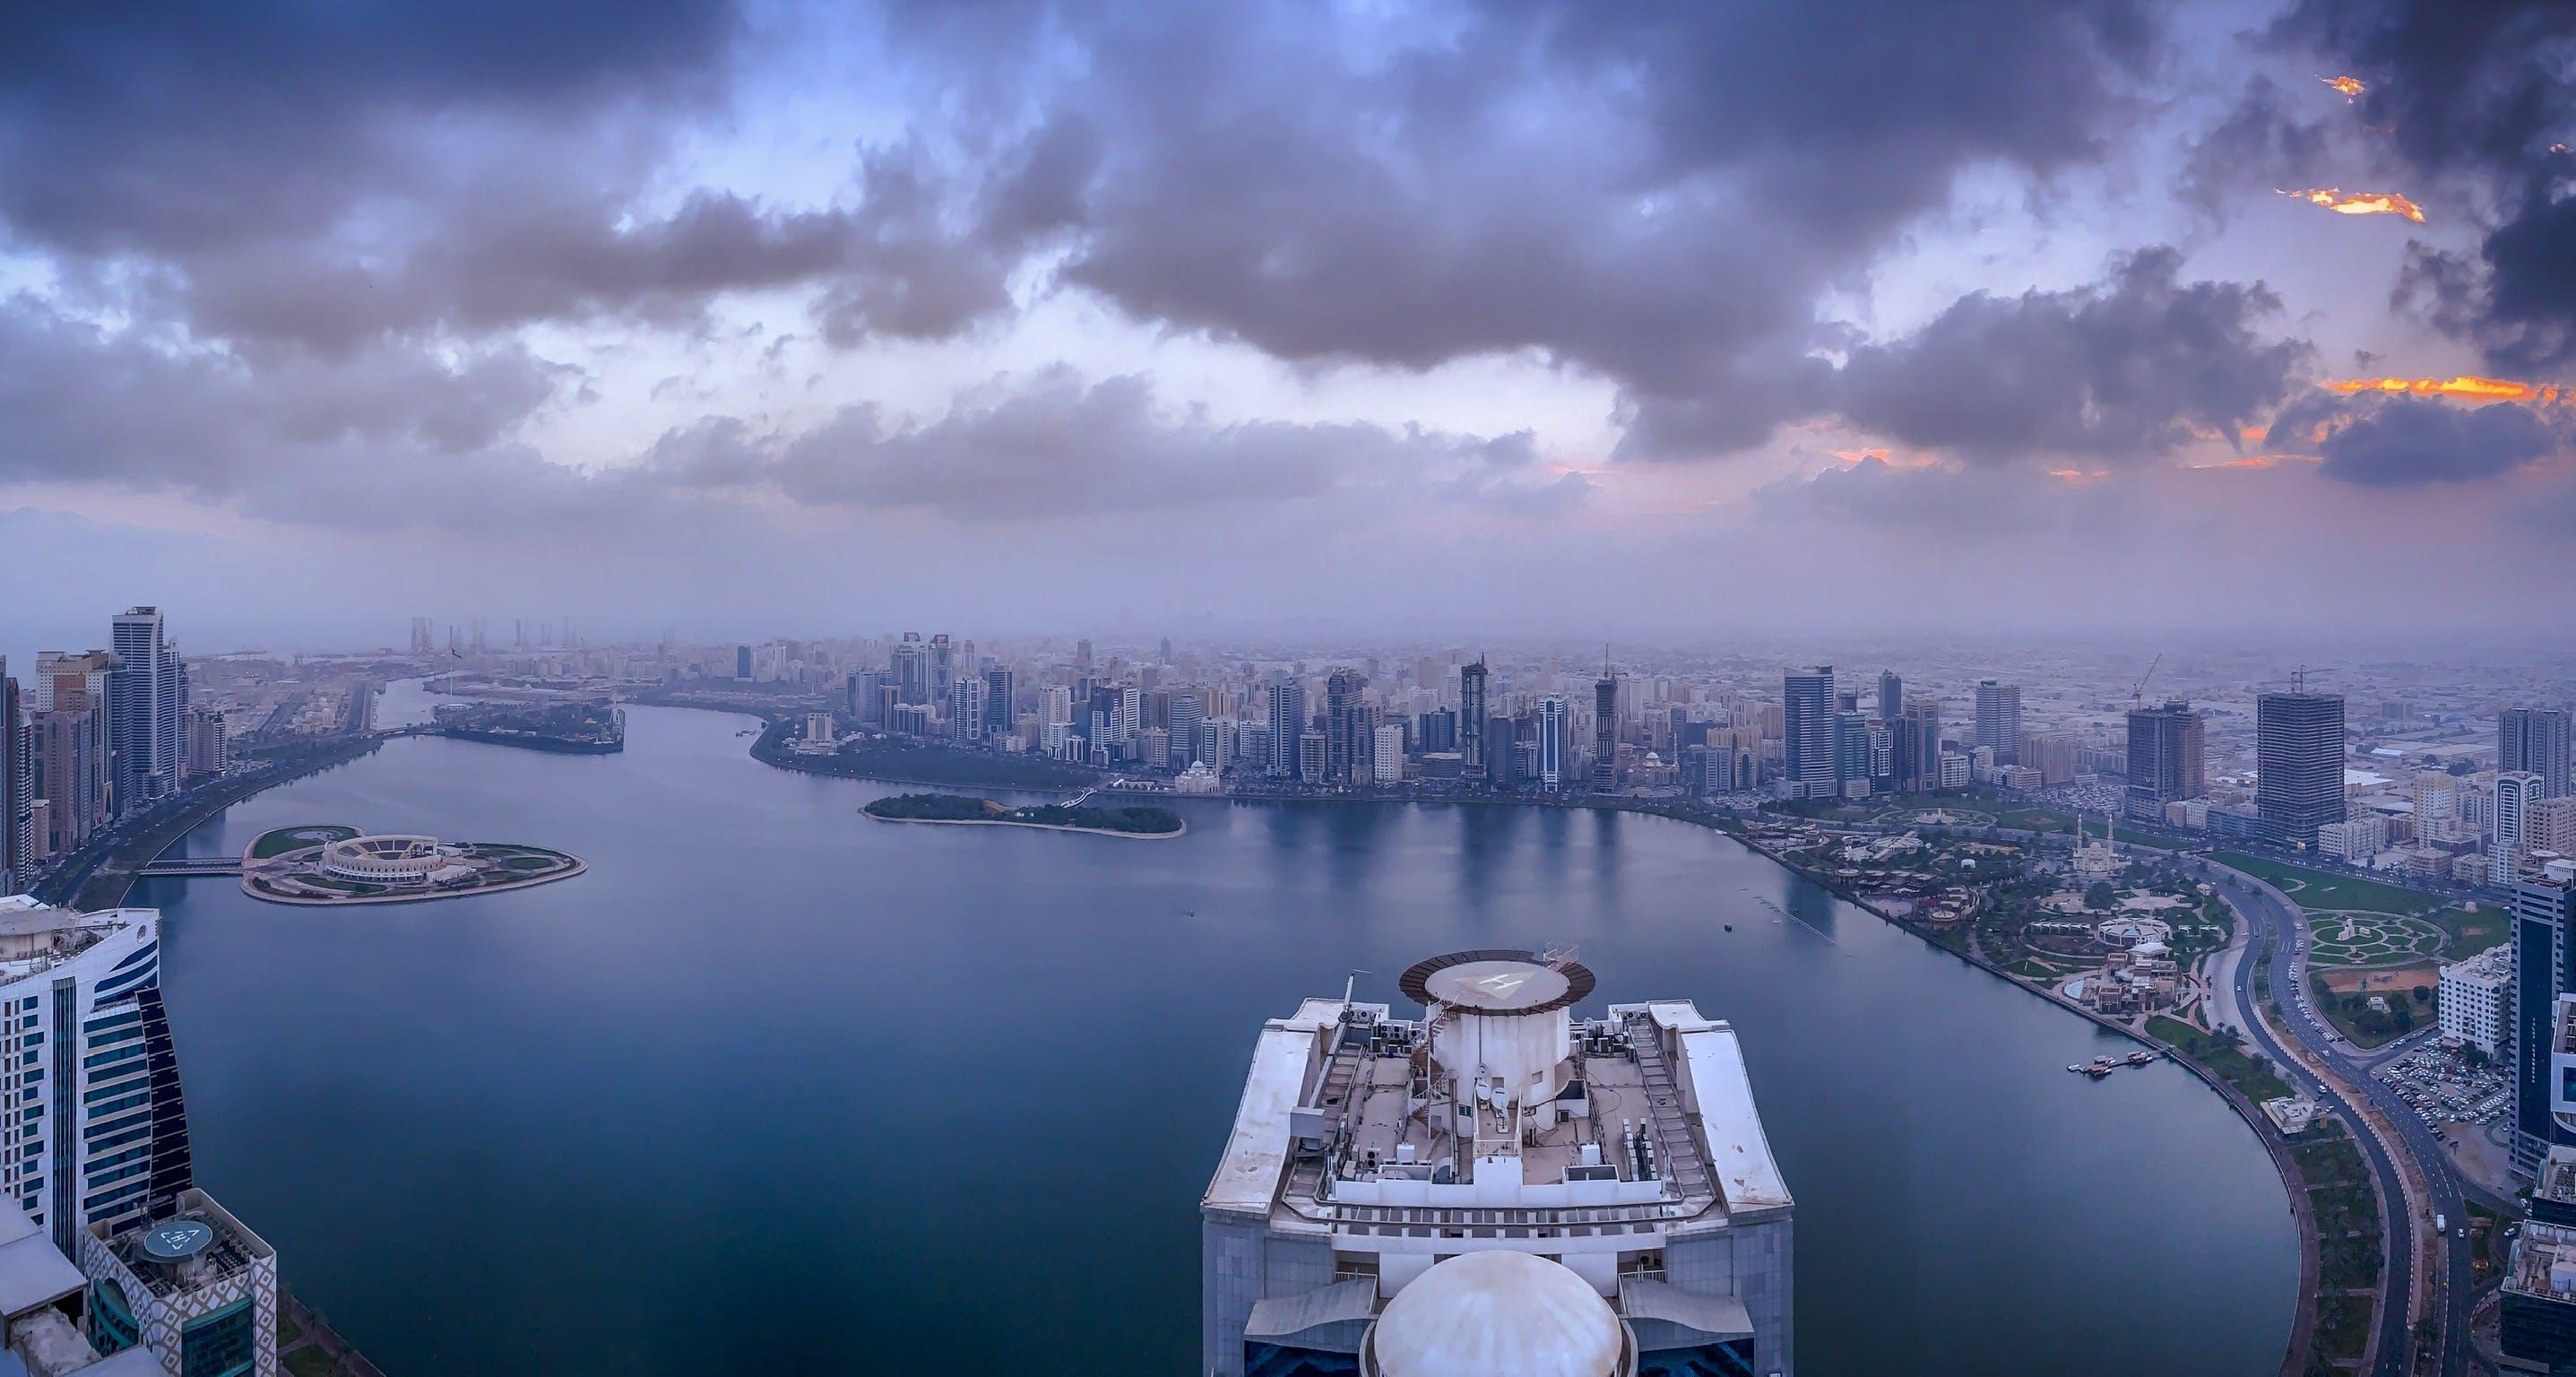 Gratis stockfoto met bird's eye view, gebouwen, h2o, luchtfoto